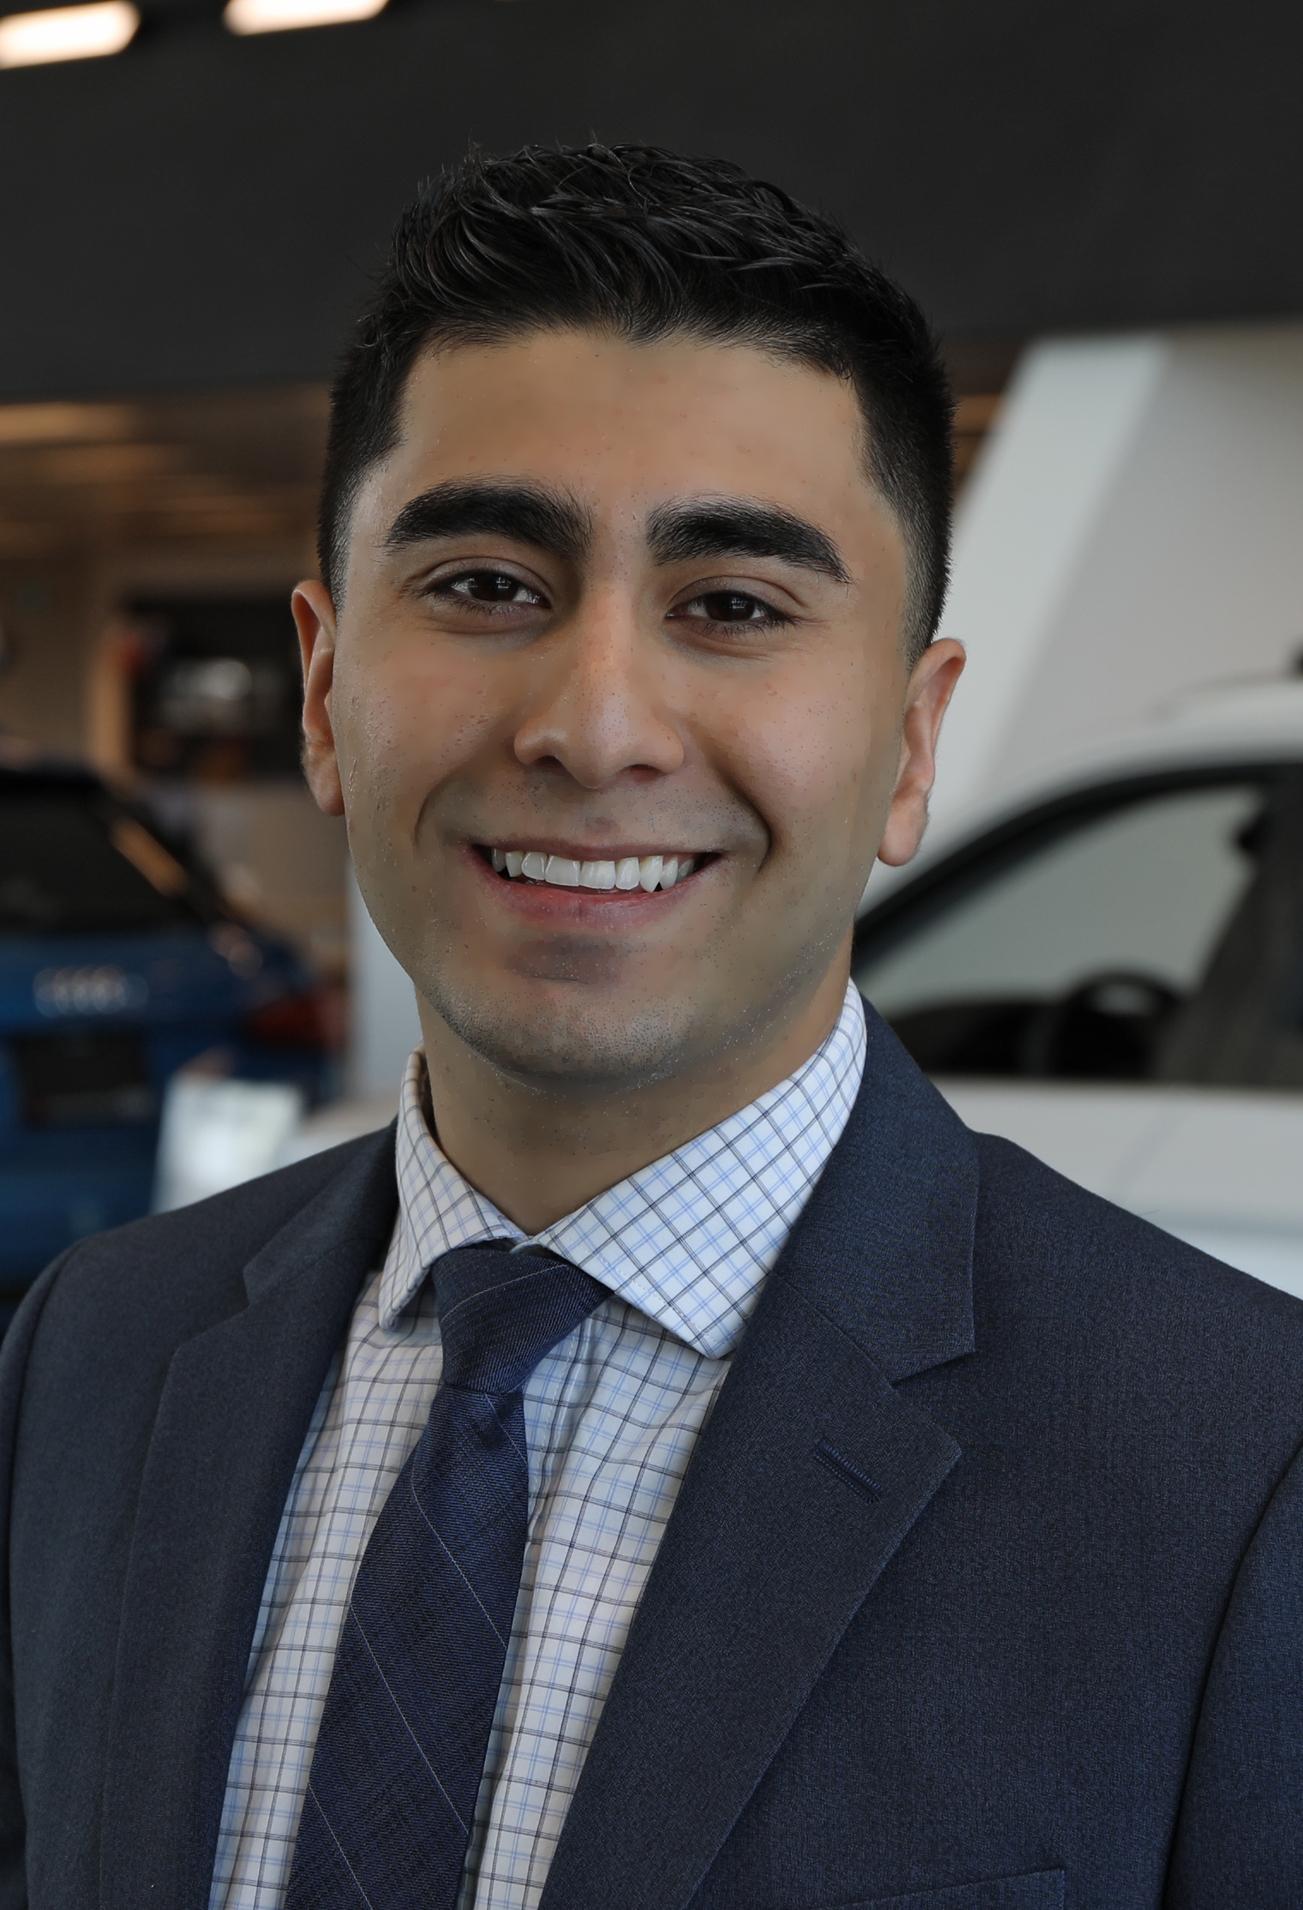 Rashid Ghaosi